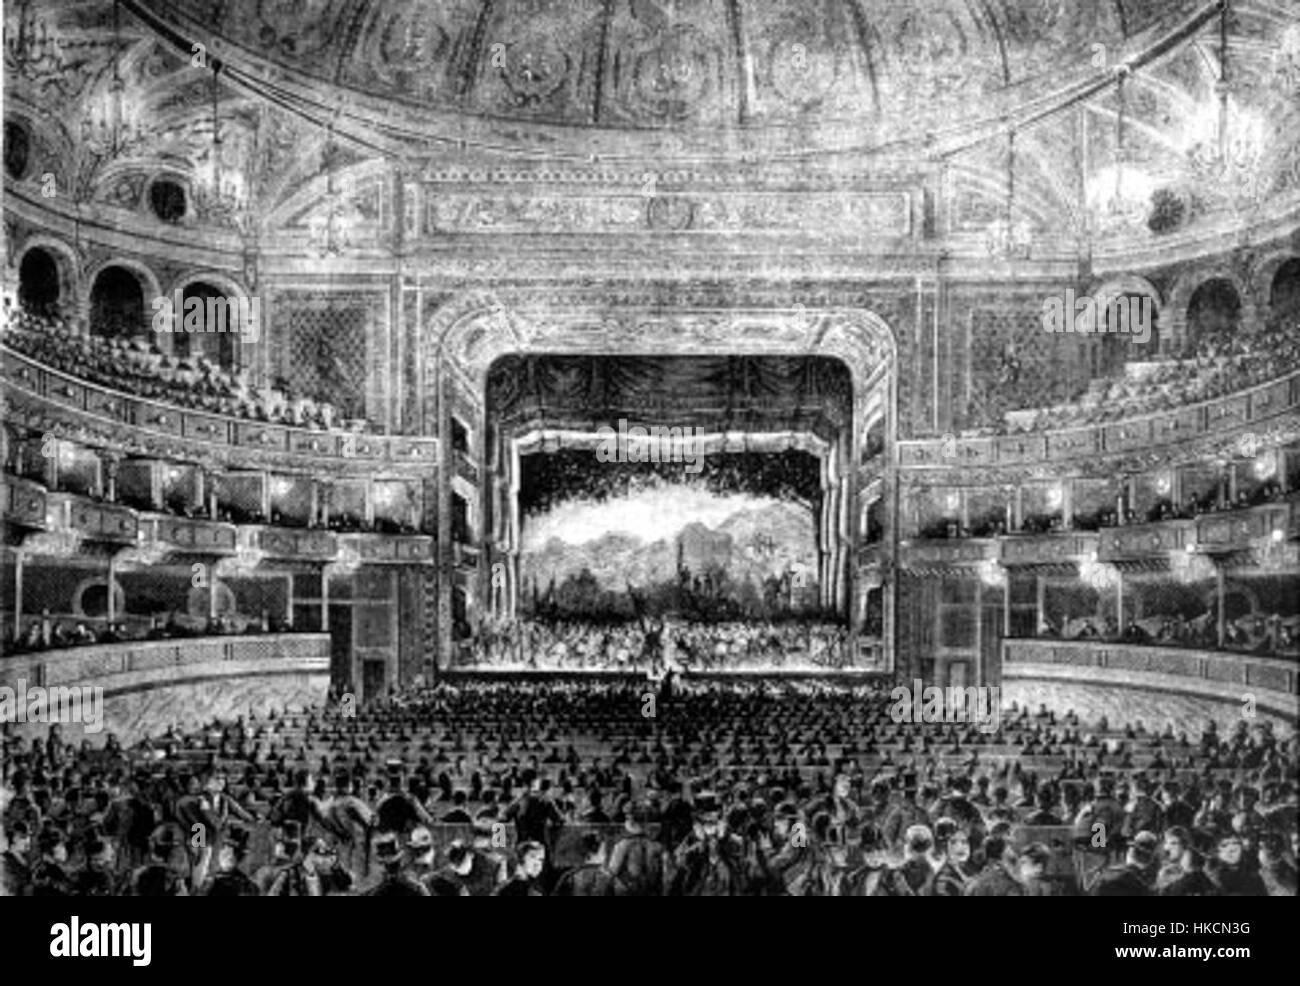 Teatro dal Verme Interior Circa 1875 - Stock Image